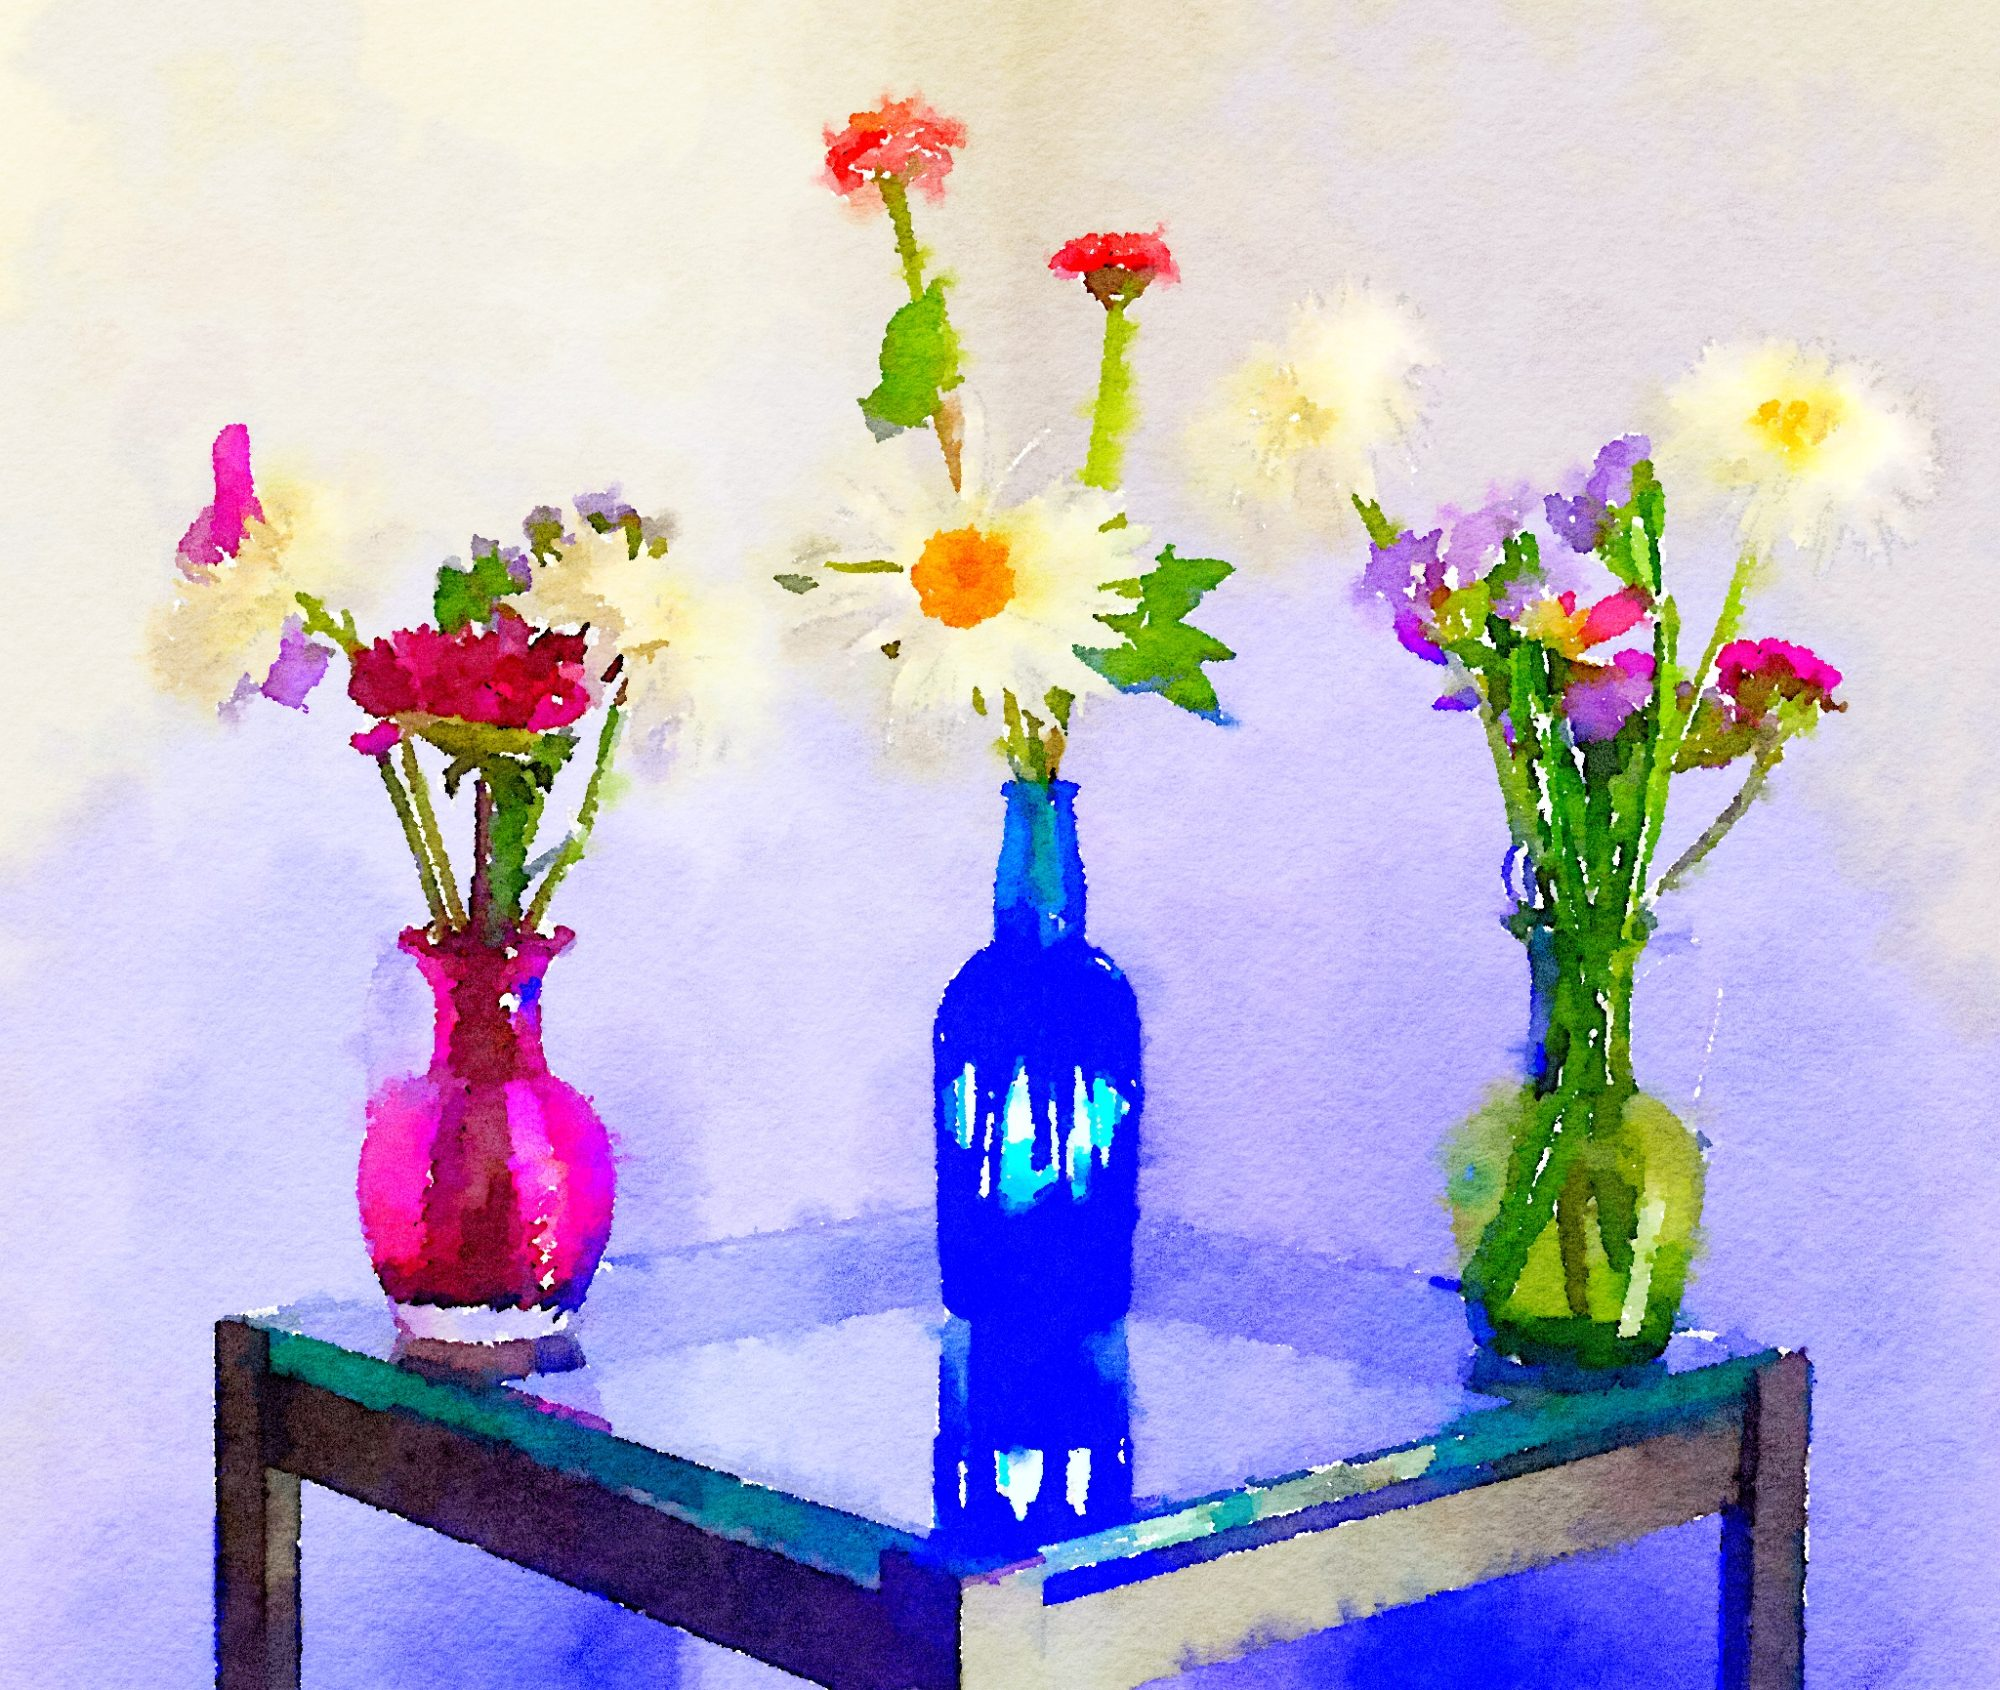 Week Twenty Four: Three Small Bouquets